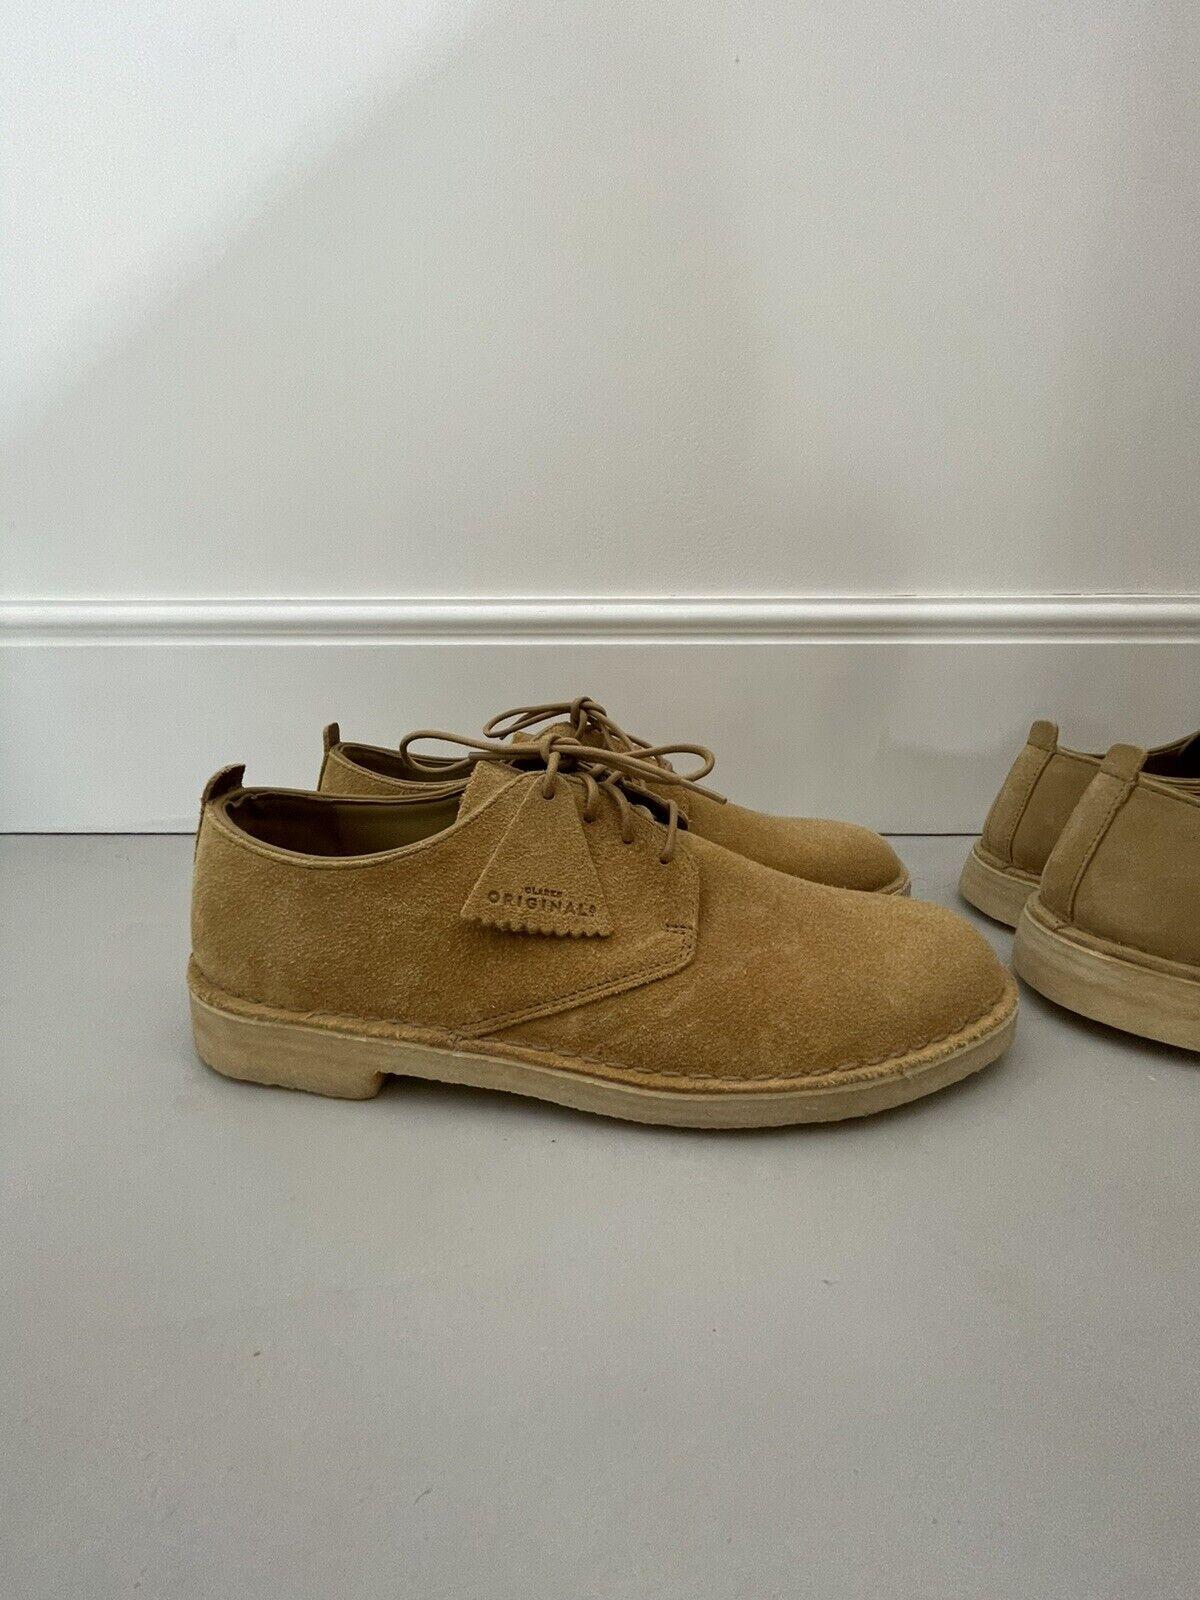 Clarks Original Desert London Shoes Oak Suede UK10.5 G (US11.5) Oi polloi NEW